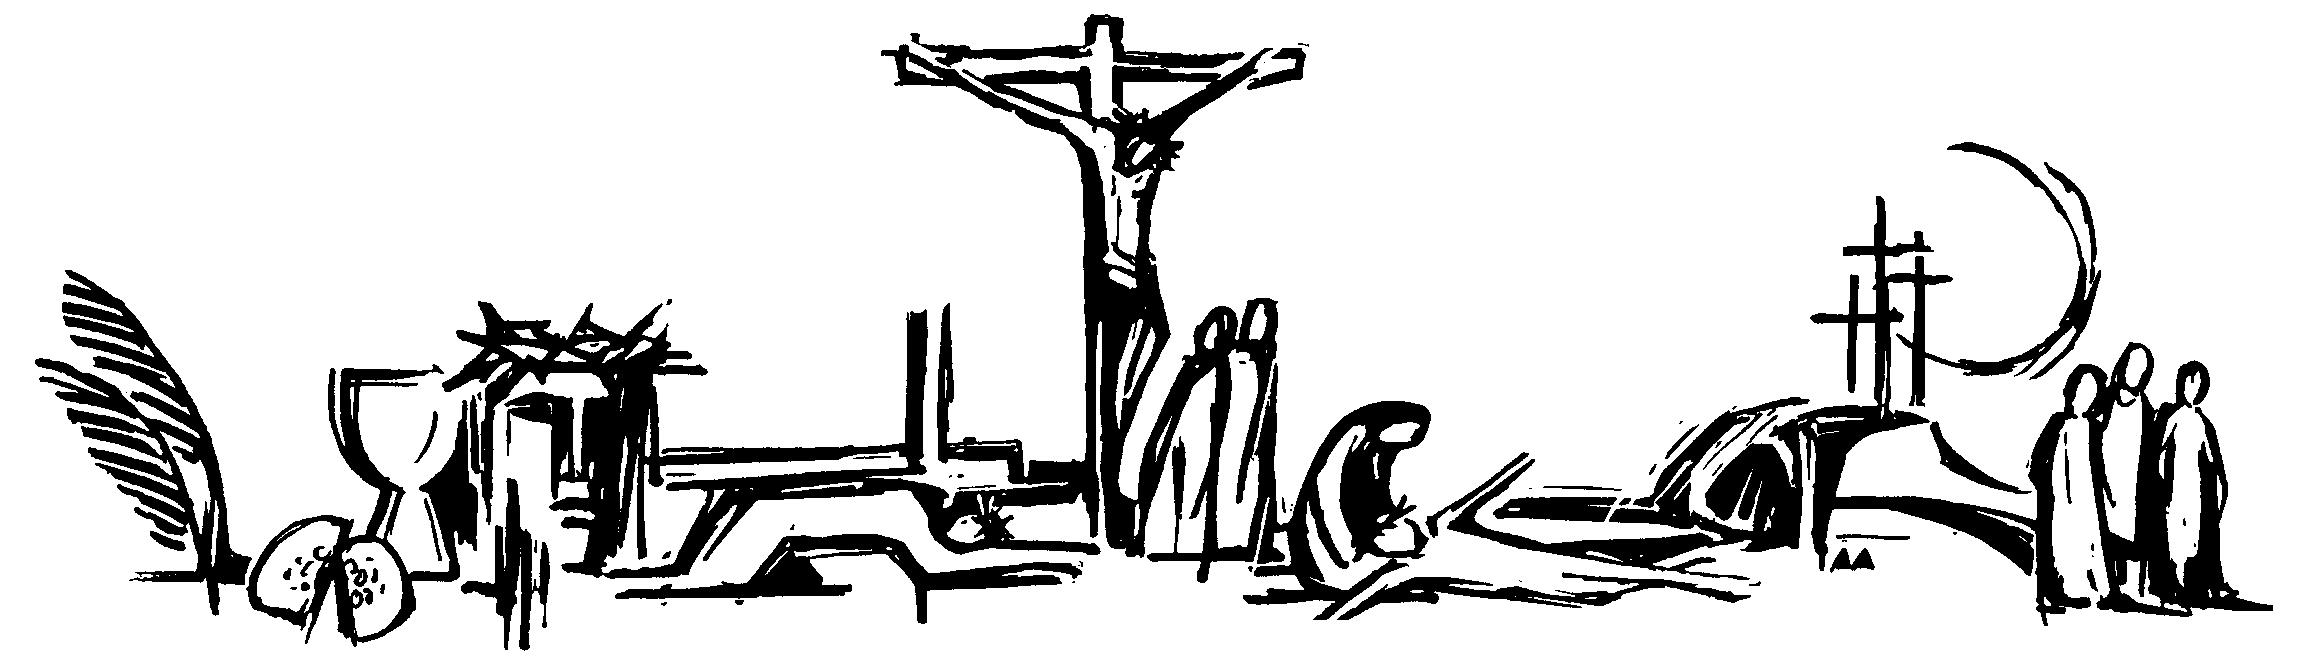 Catholic lenten clipart jpg royalty free stock Free Catholic Lenten Clipart   CINEMAS 93 jpg royalty free stock